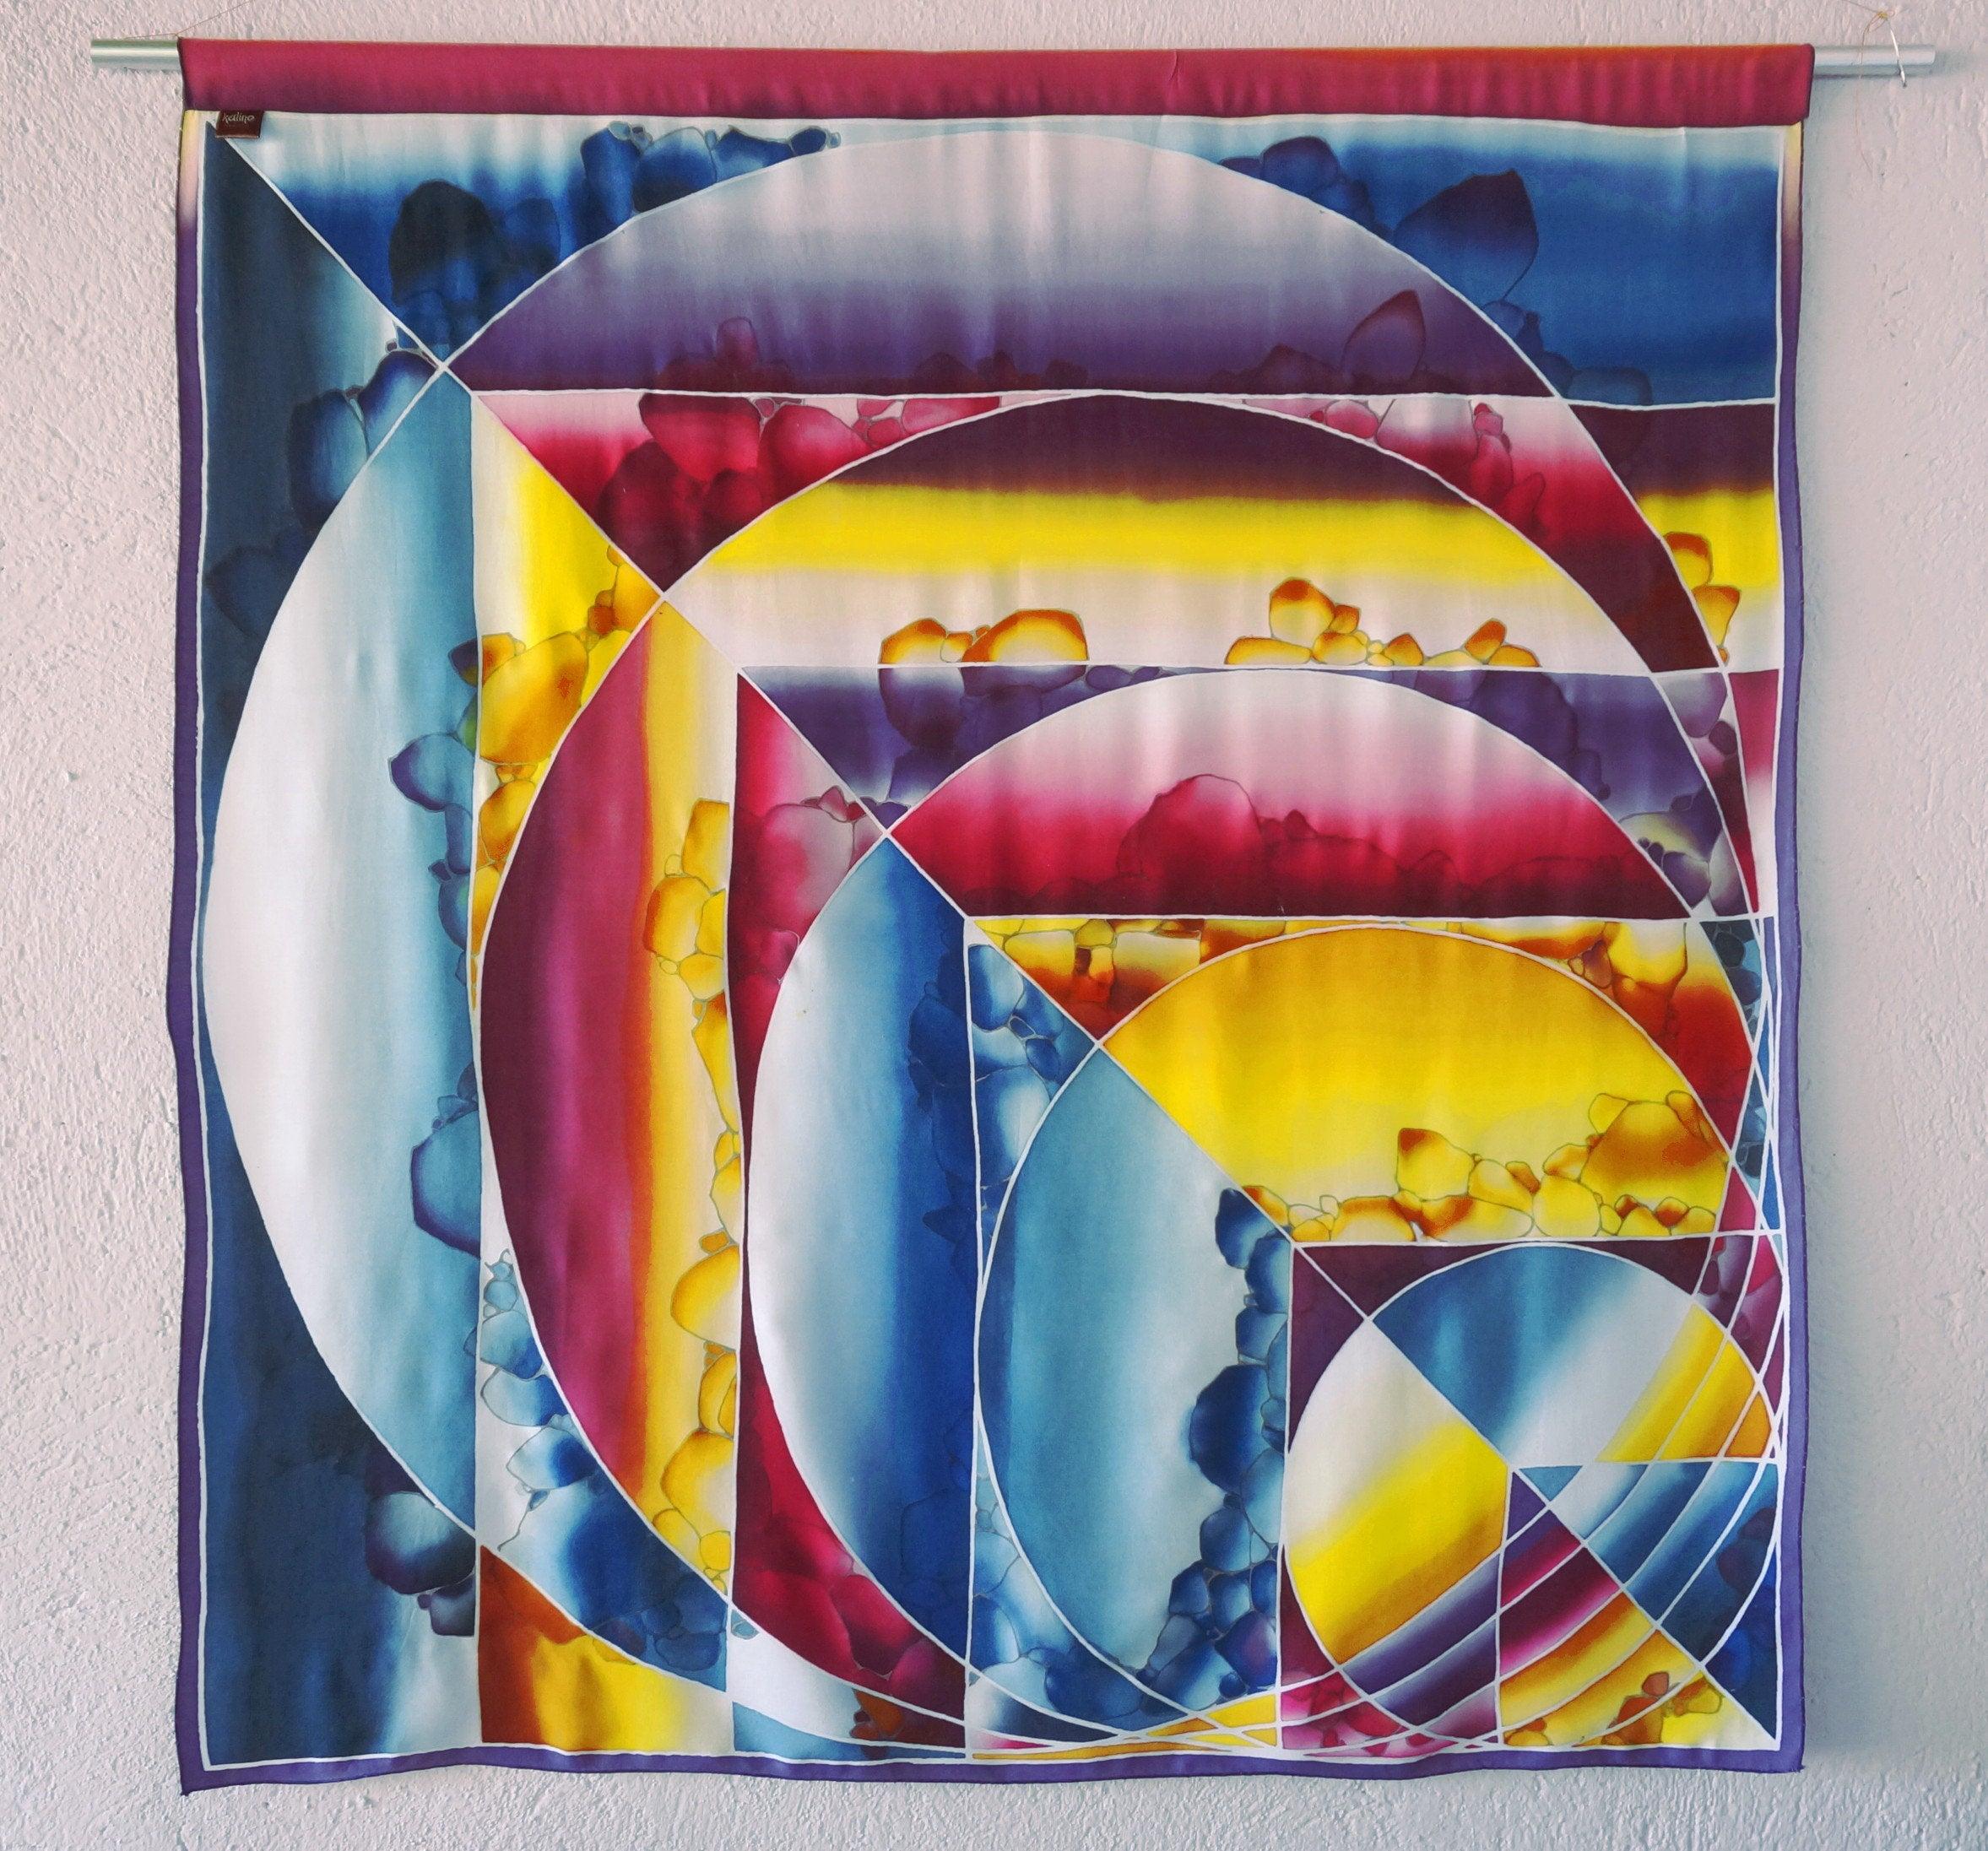 Contemporary Geometric Wall Art Batik Wall Hanging, Home Decor Mid Century  Design, Decorative Batik Multi-Color, Boho Style Rainbow Prism in Contemporary Geometric Wall Decor (Image 5 of 30)